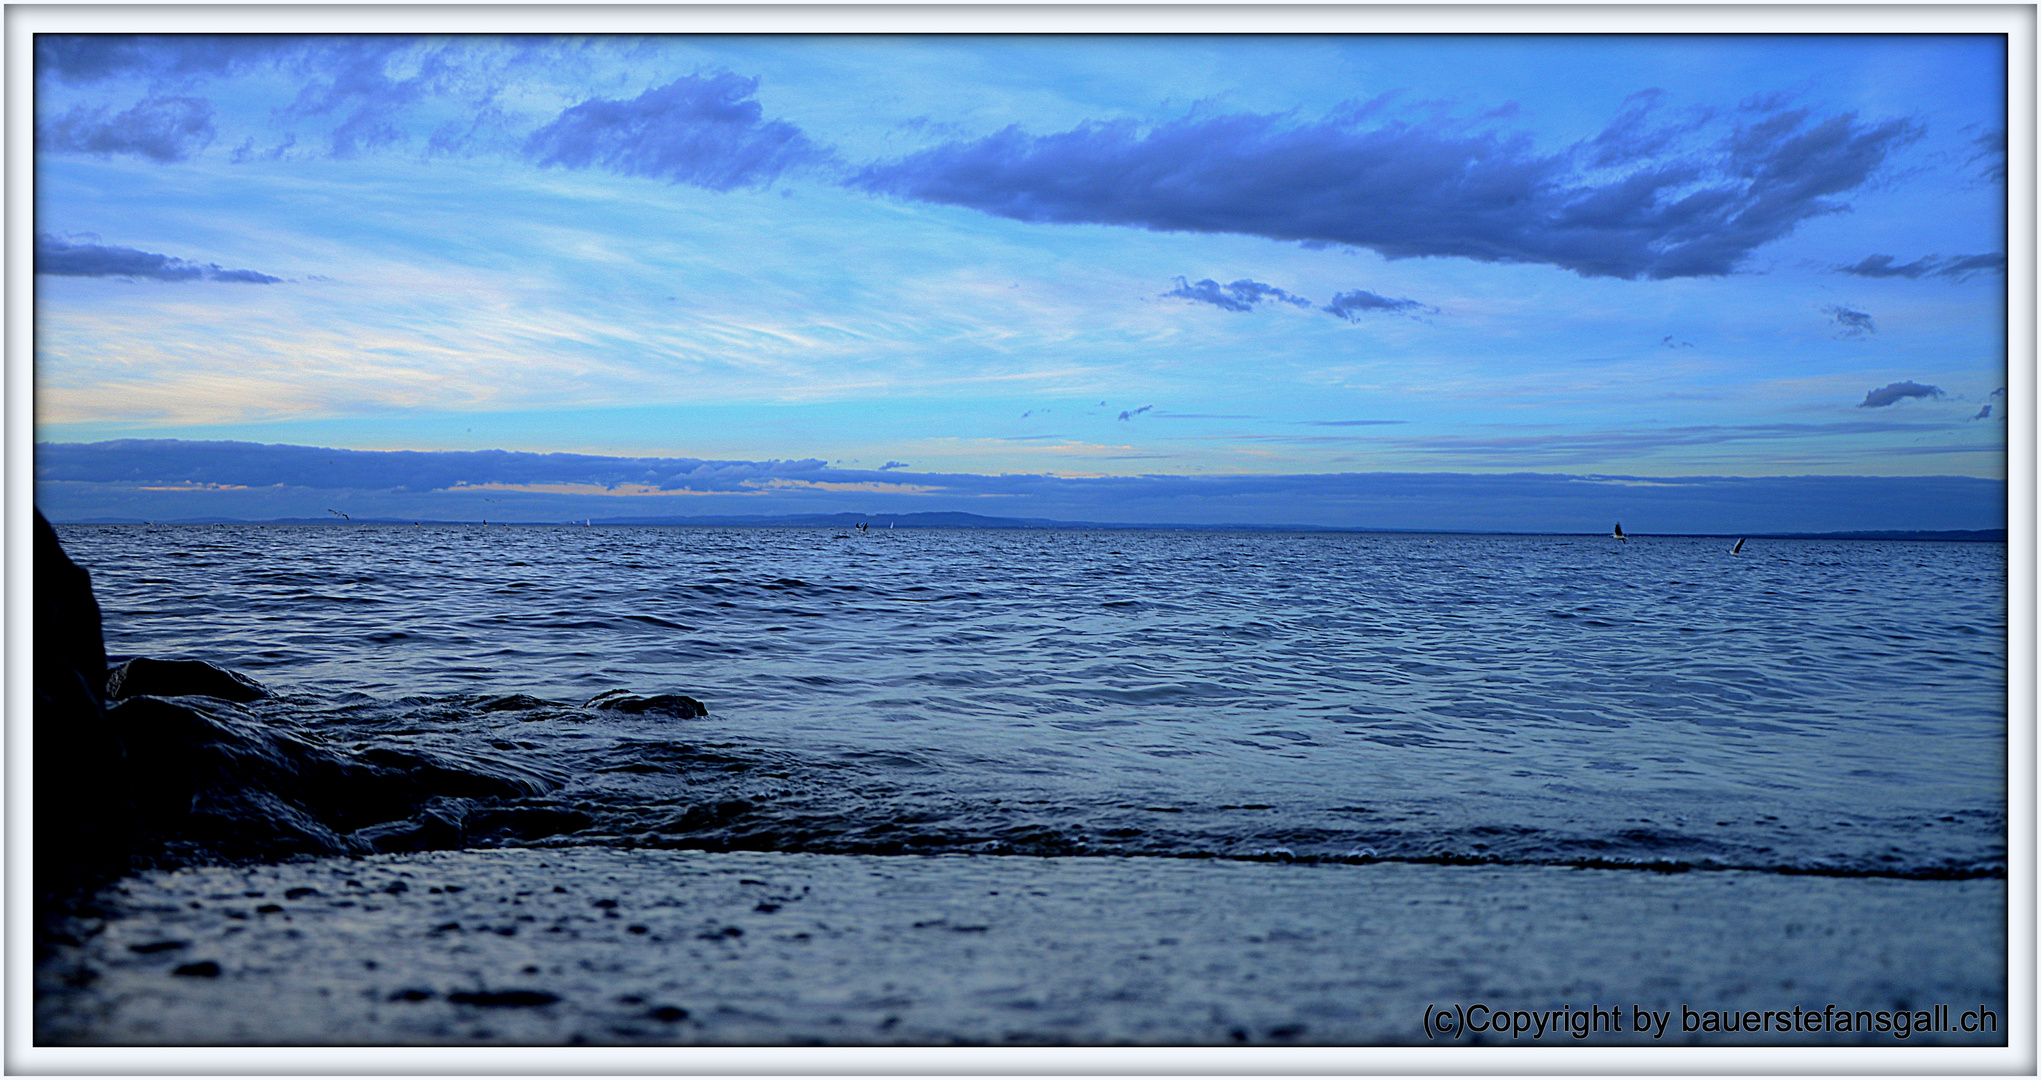 Das schwäbische Meer